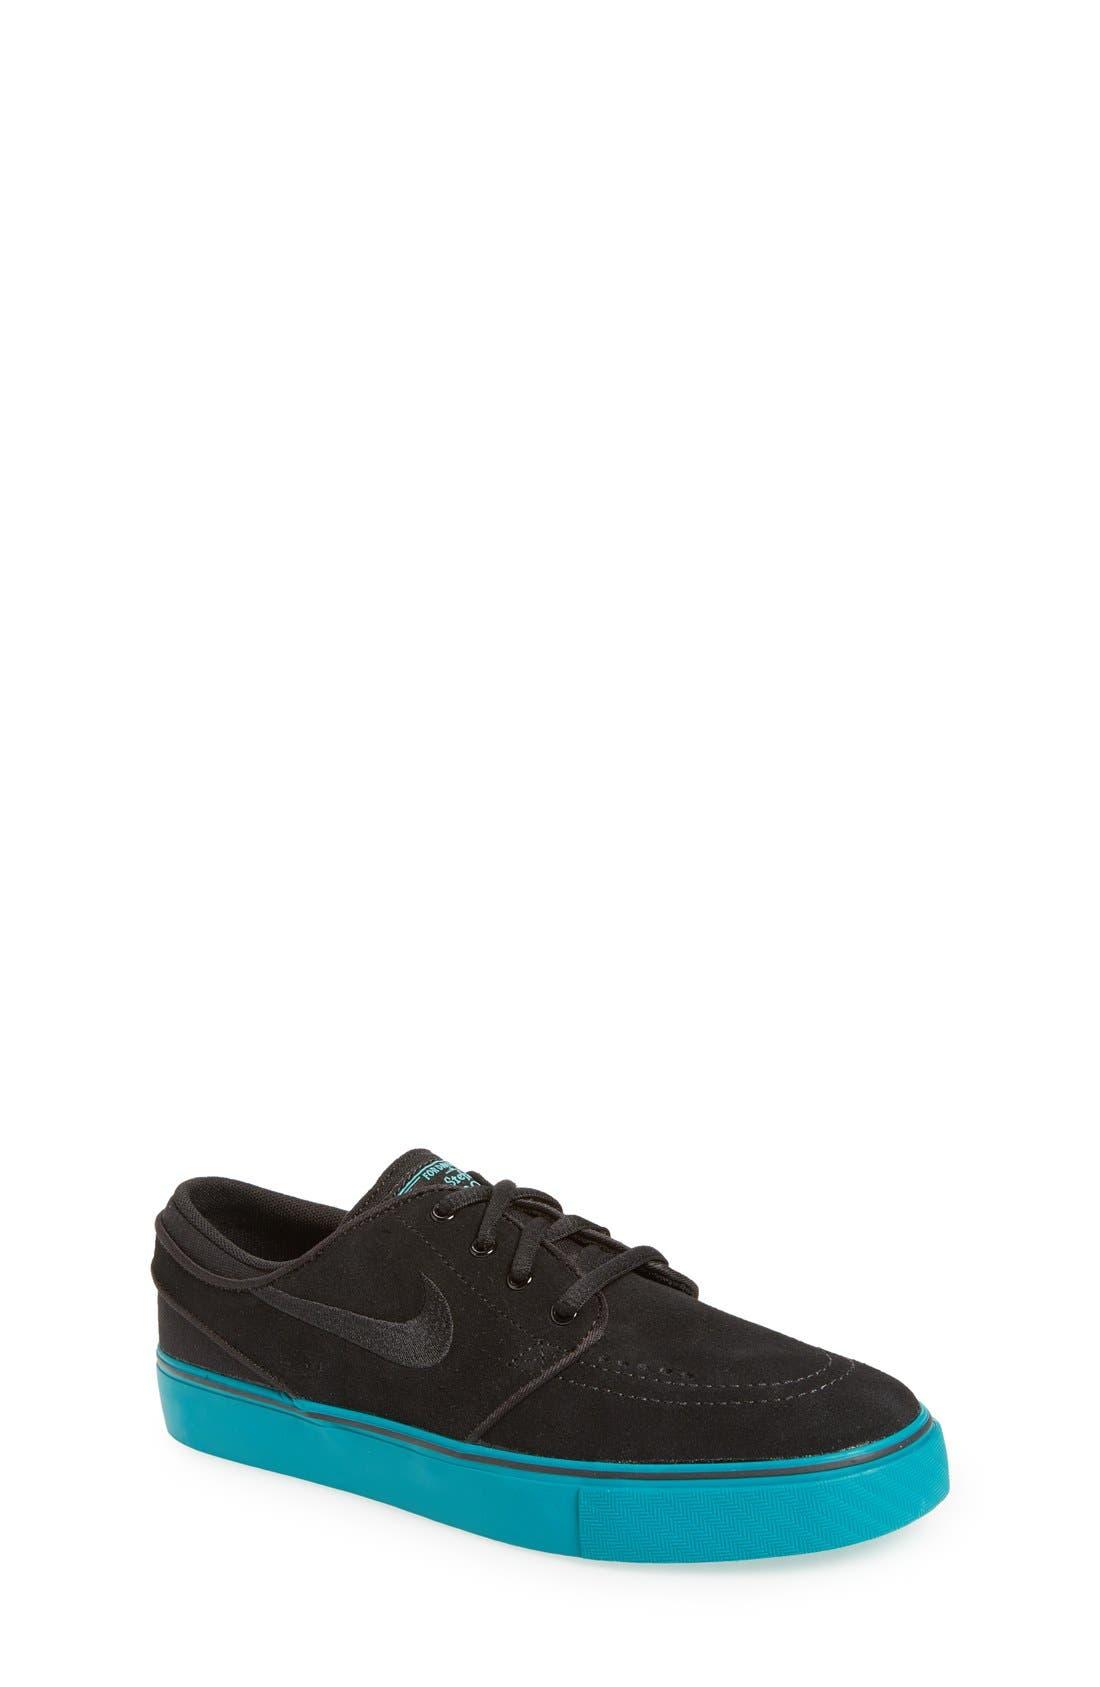 'Stefan Janoski' Sneaker,                             Main thumbnail 4, color,